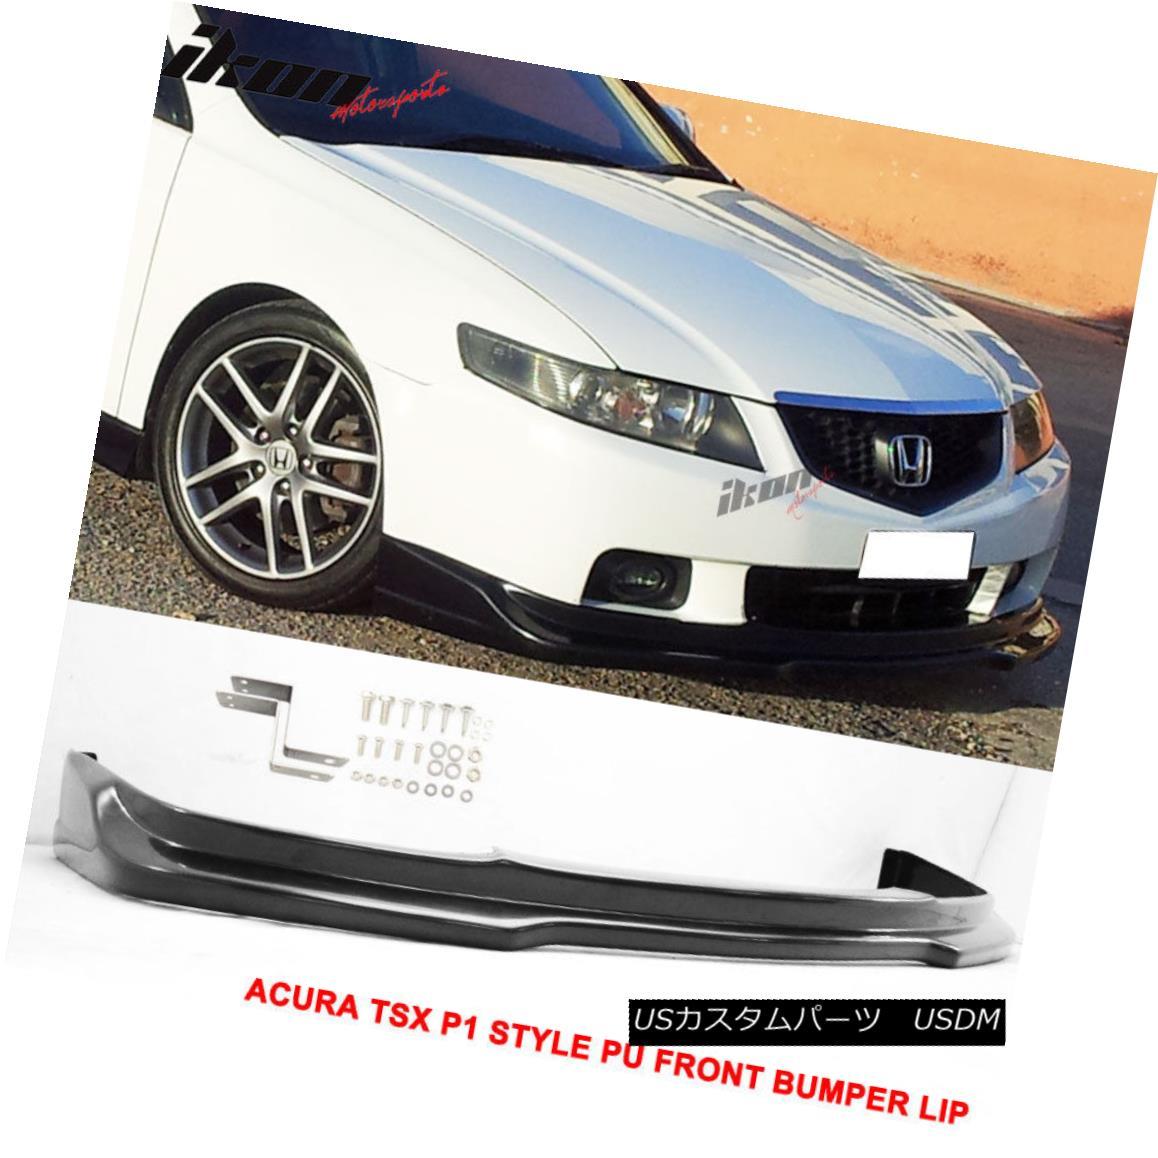 Fits 09-10 Acura TSX CU1 JDM Style Front Bumper Lip Spoiler Body Kit Black PU